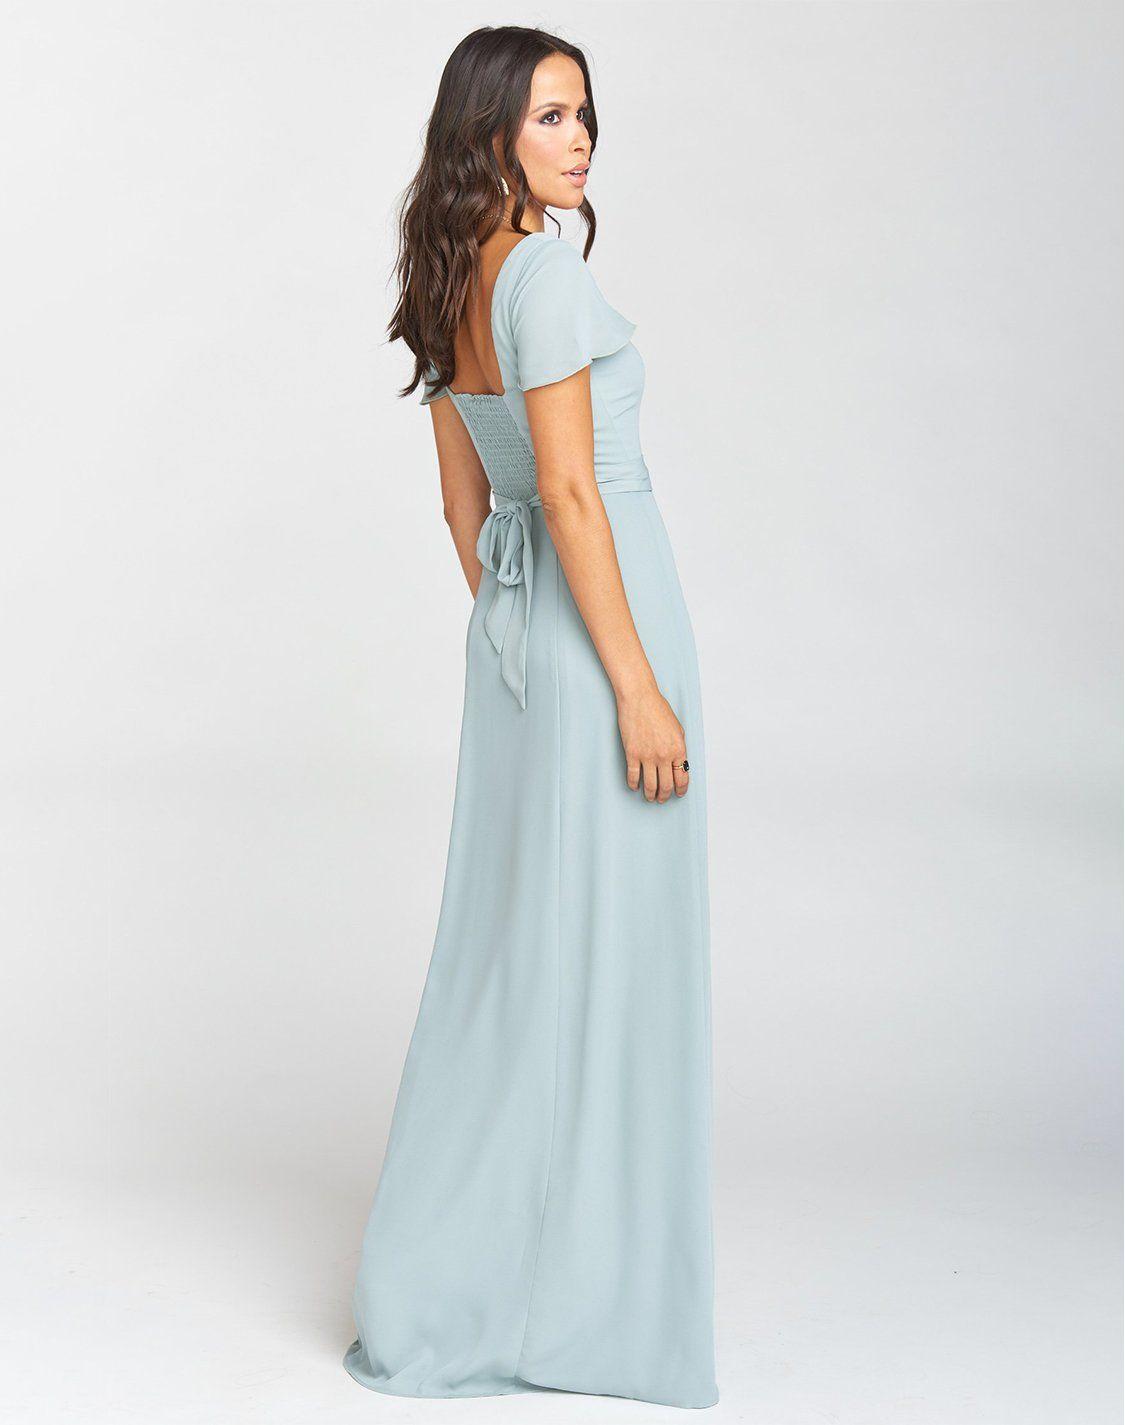 Marie Sweetheart Maxi Dress Silver Sage Crisp In 2021 Dresses Sweetheart Dress Silver Dress [ 1425 x 1125 Pixel ]